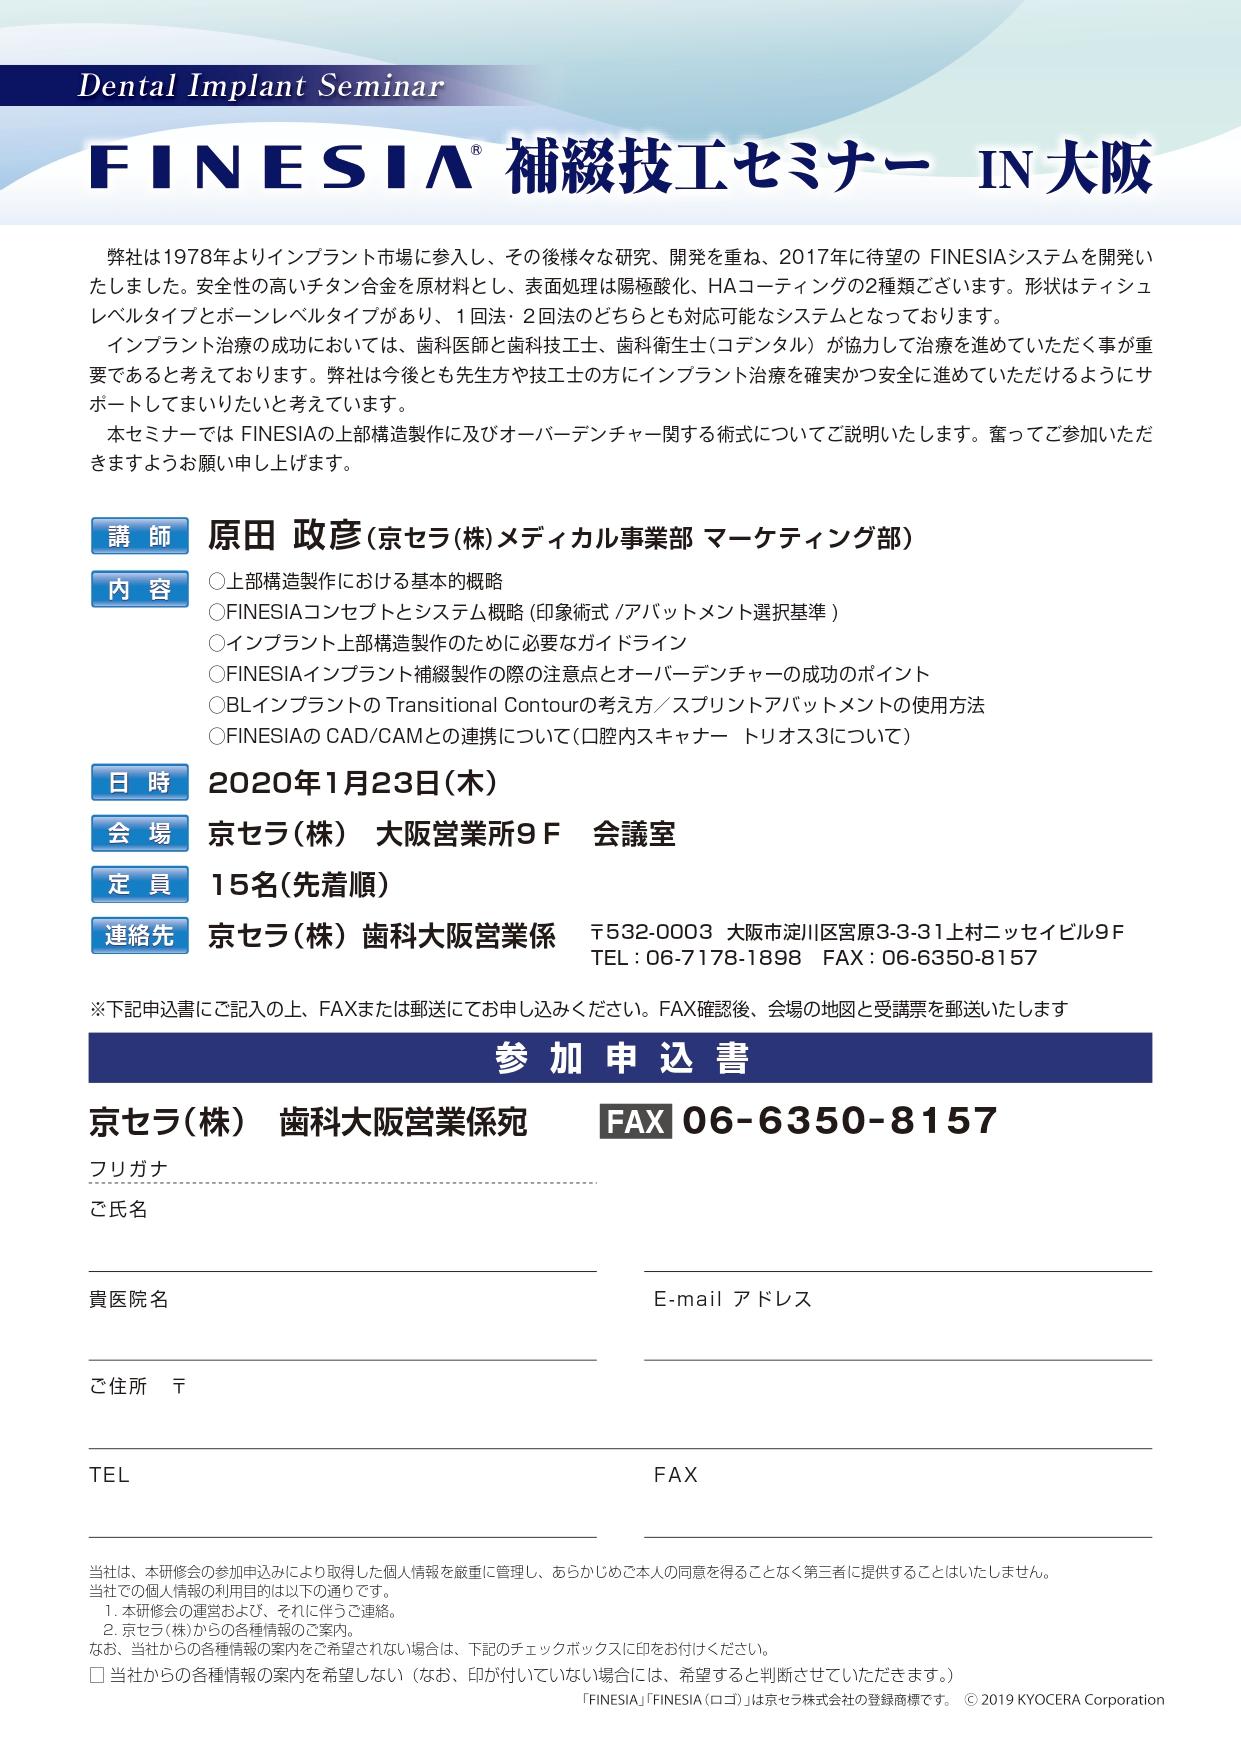 【参加費無料】FINESIA 補綴技工セミナー IN 大阪